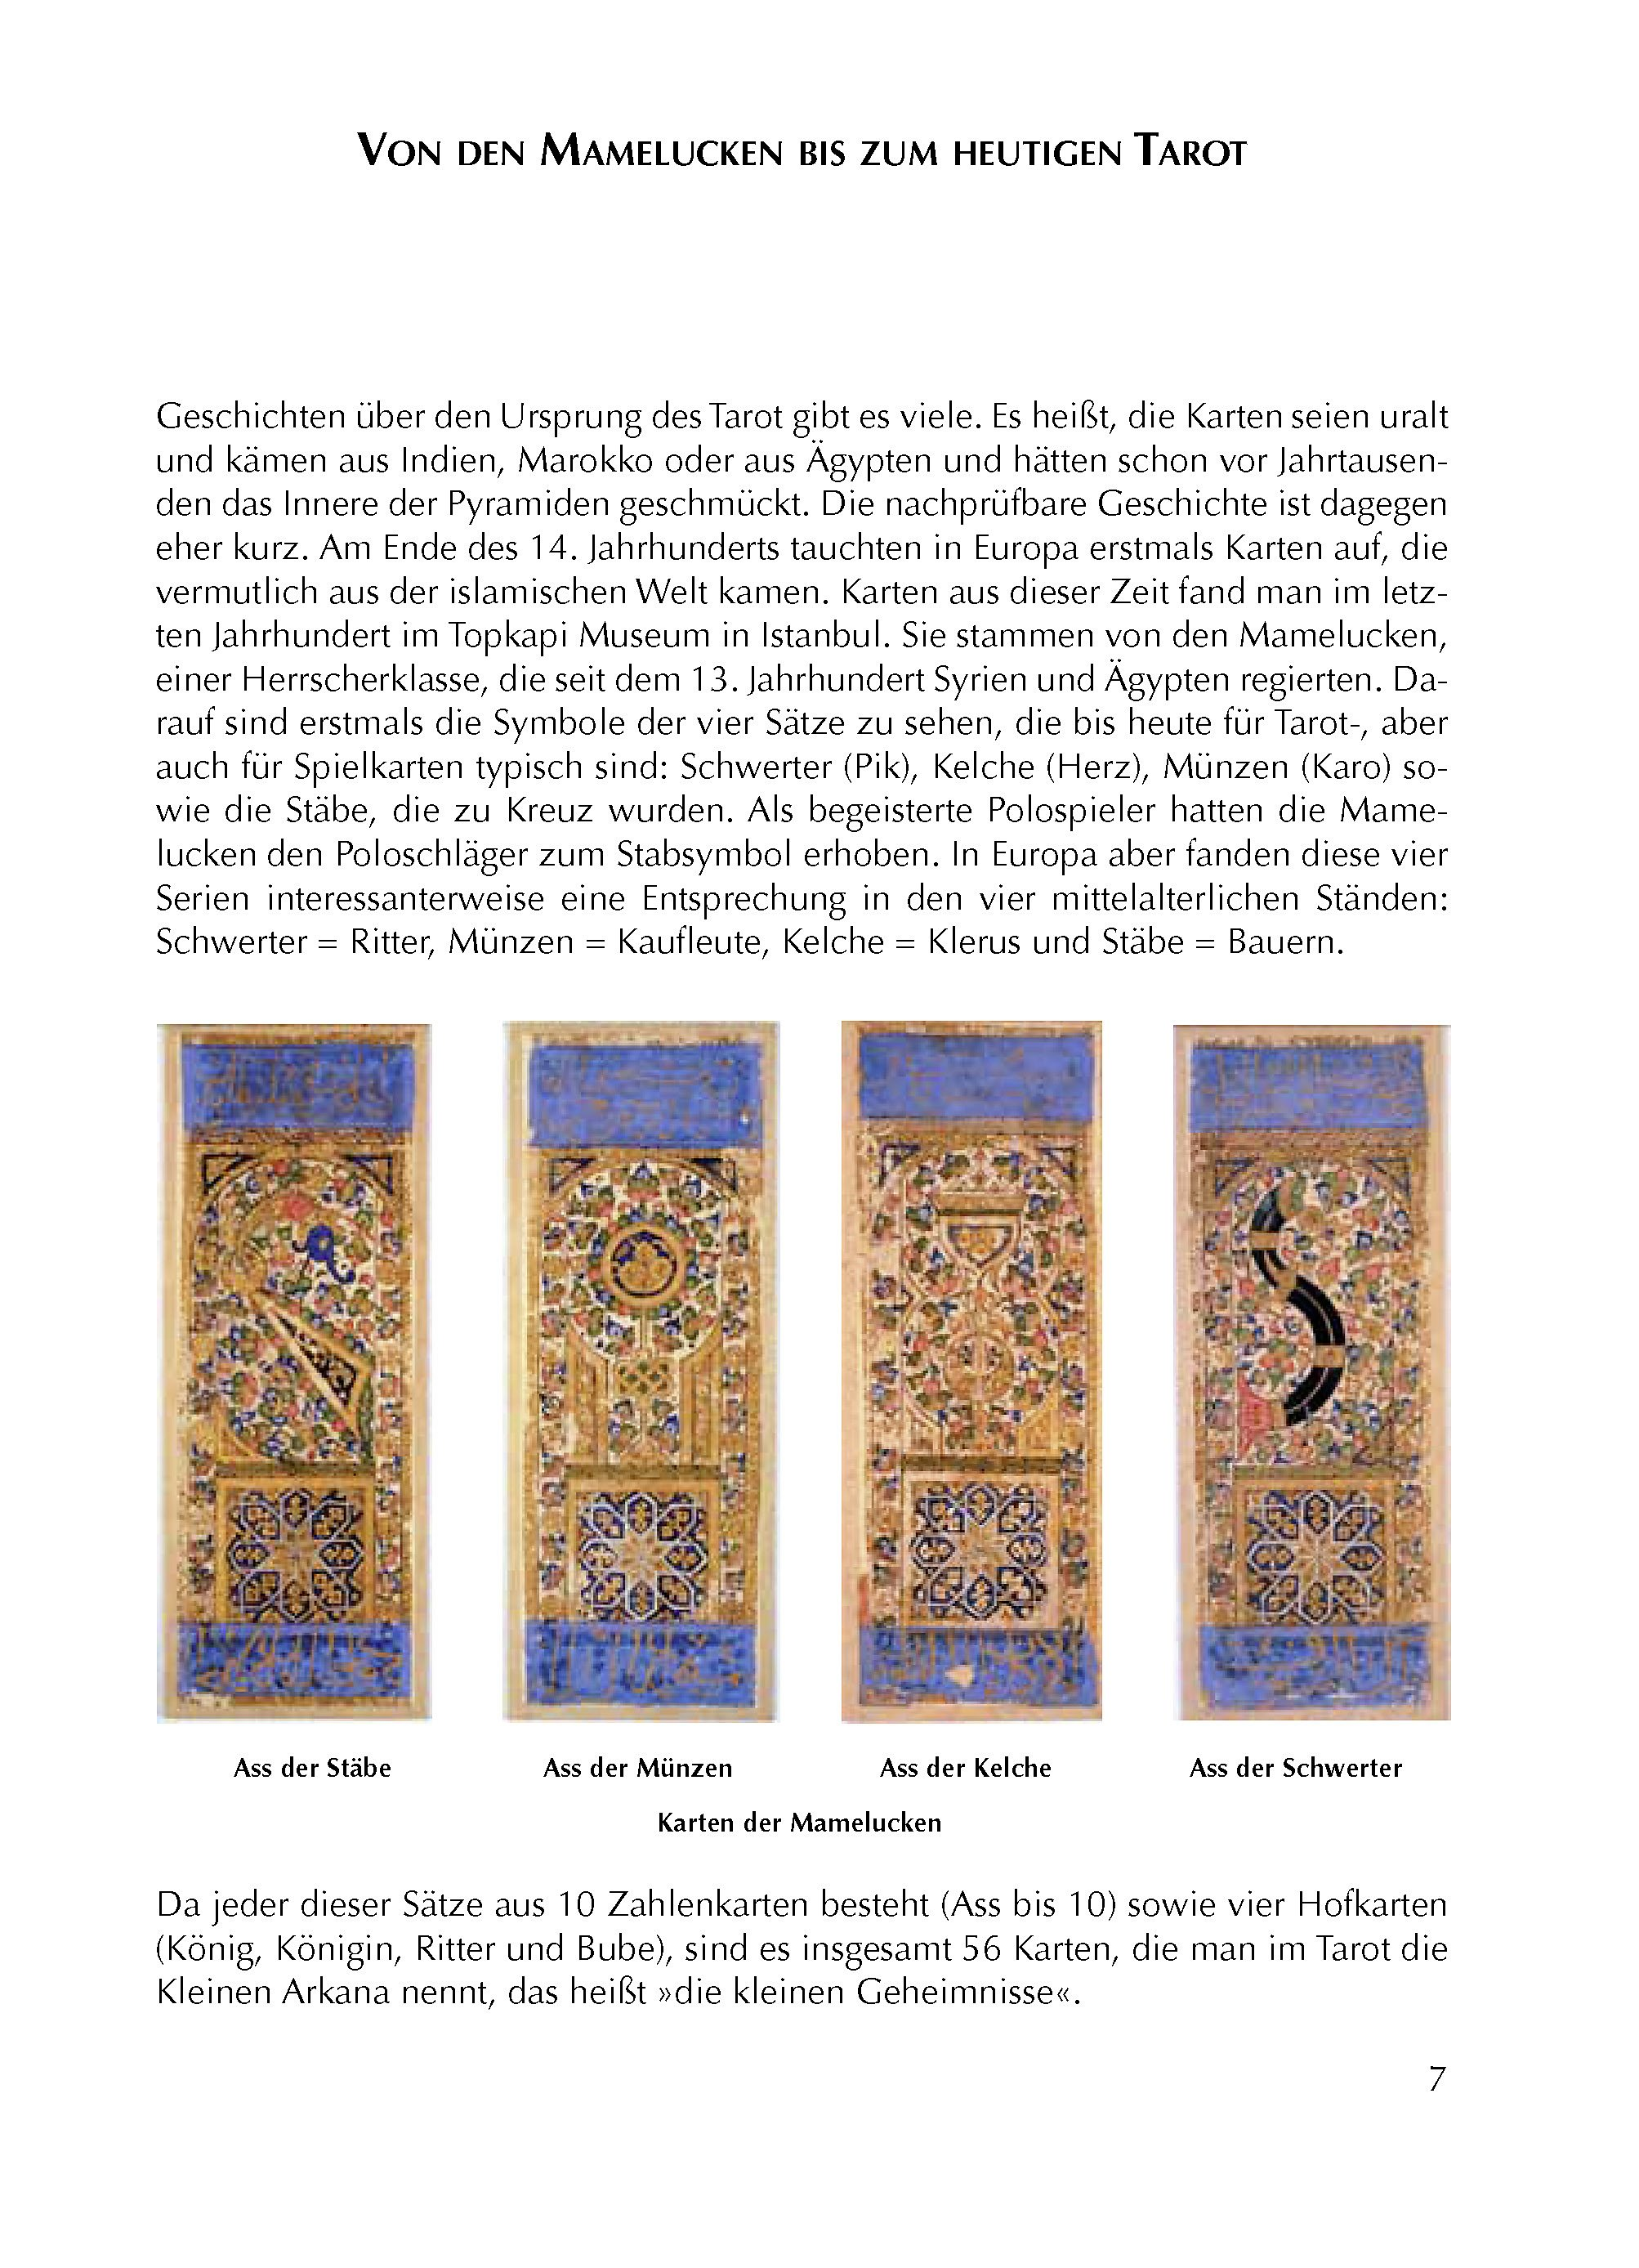 Gut Beraten Mit Tarot M 78 Rider Waite Tarotkarten Buch